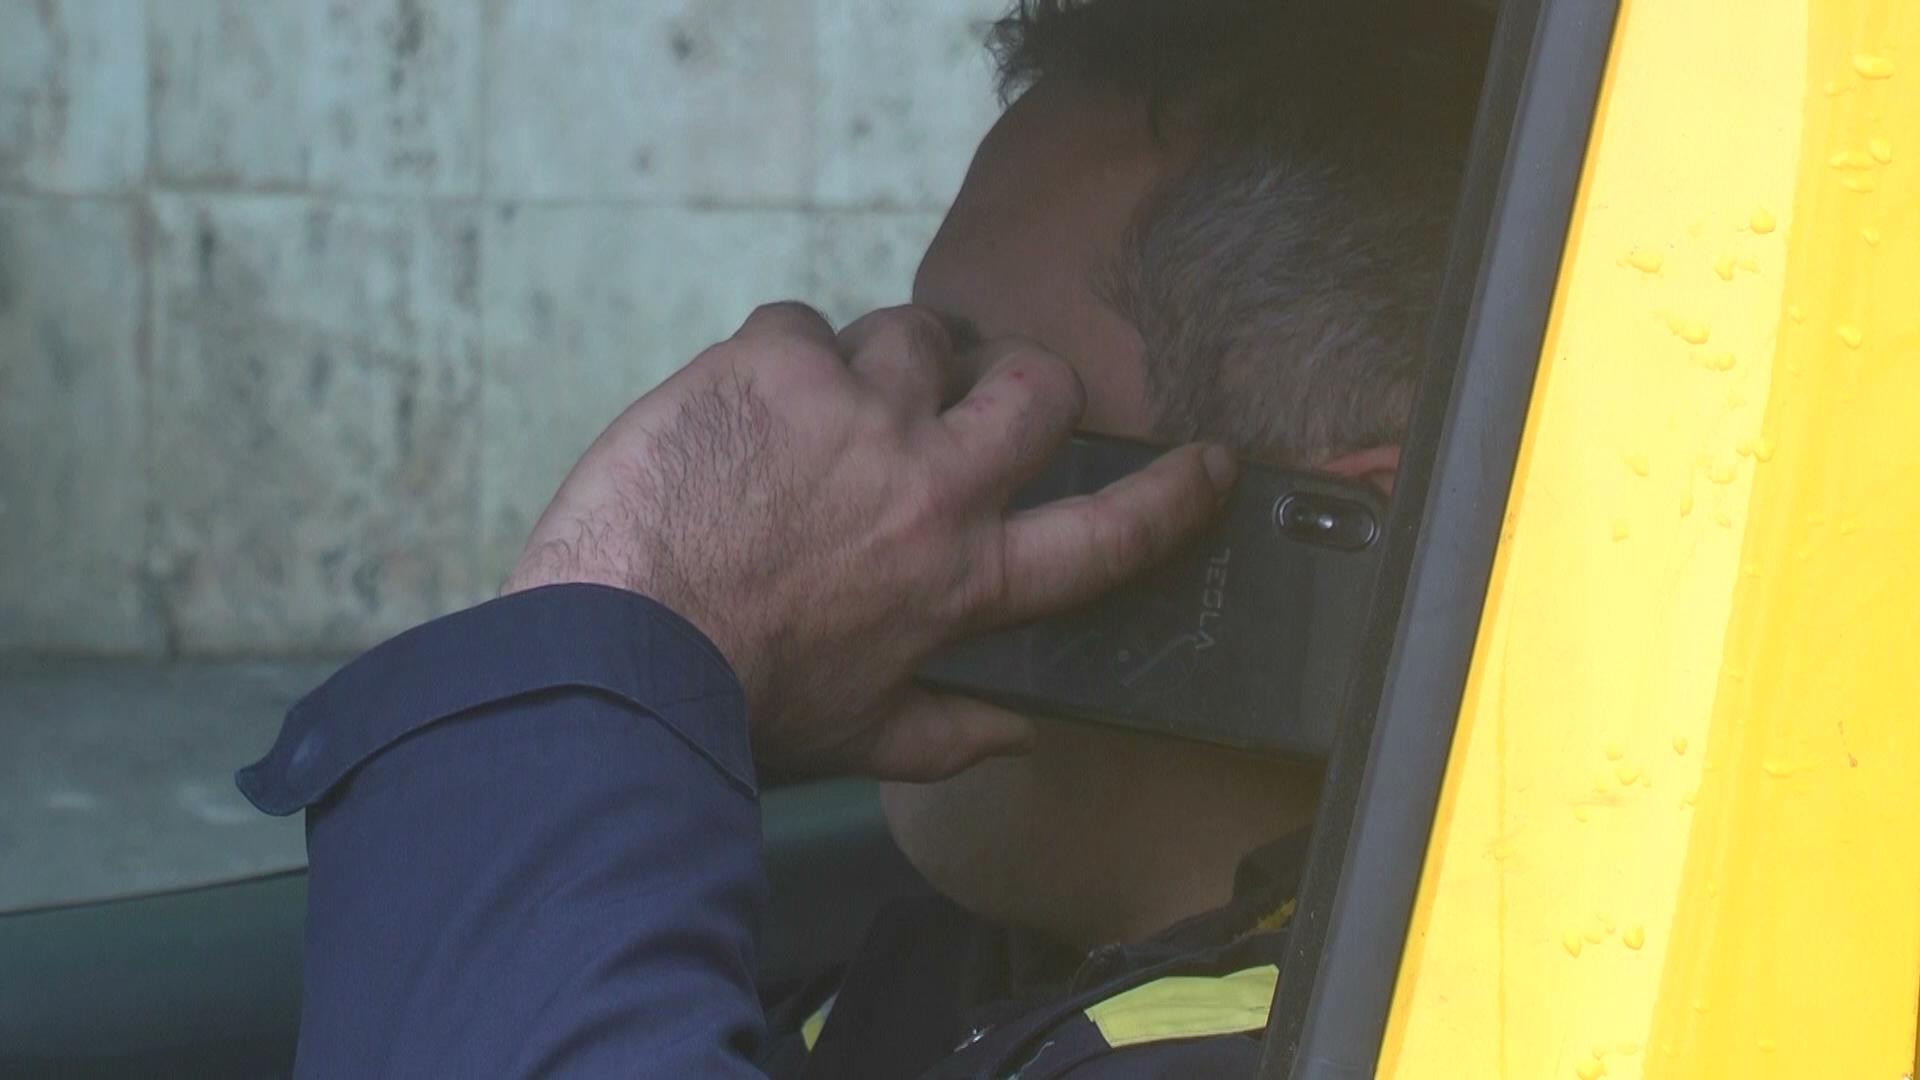 Čuvaj sebe, misli na druge: Korišćenje mobilnog telefona tokom vožnje